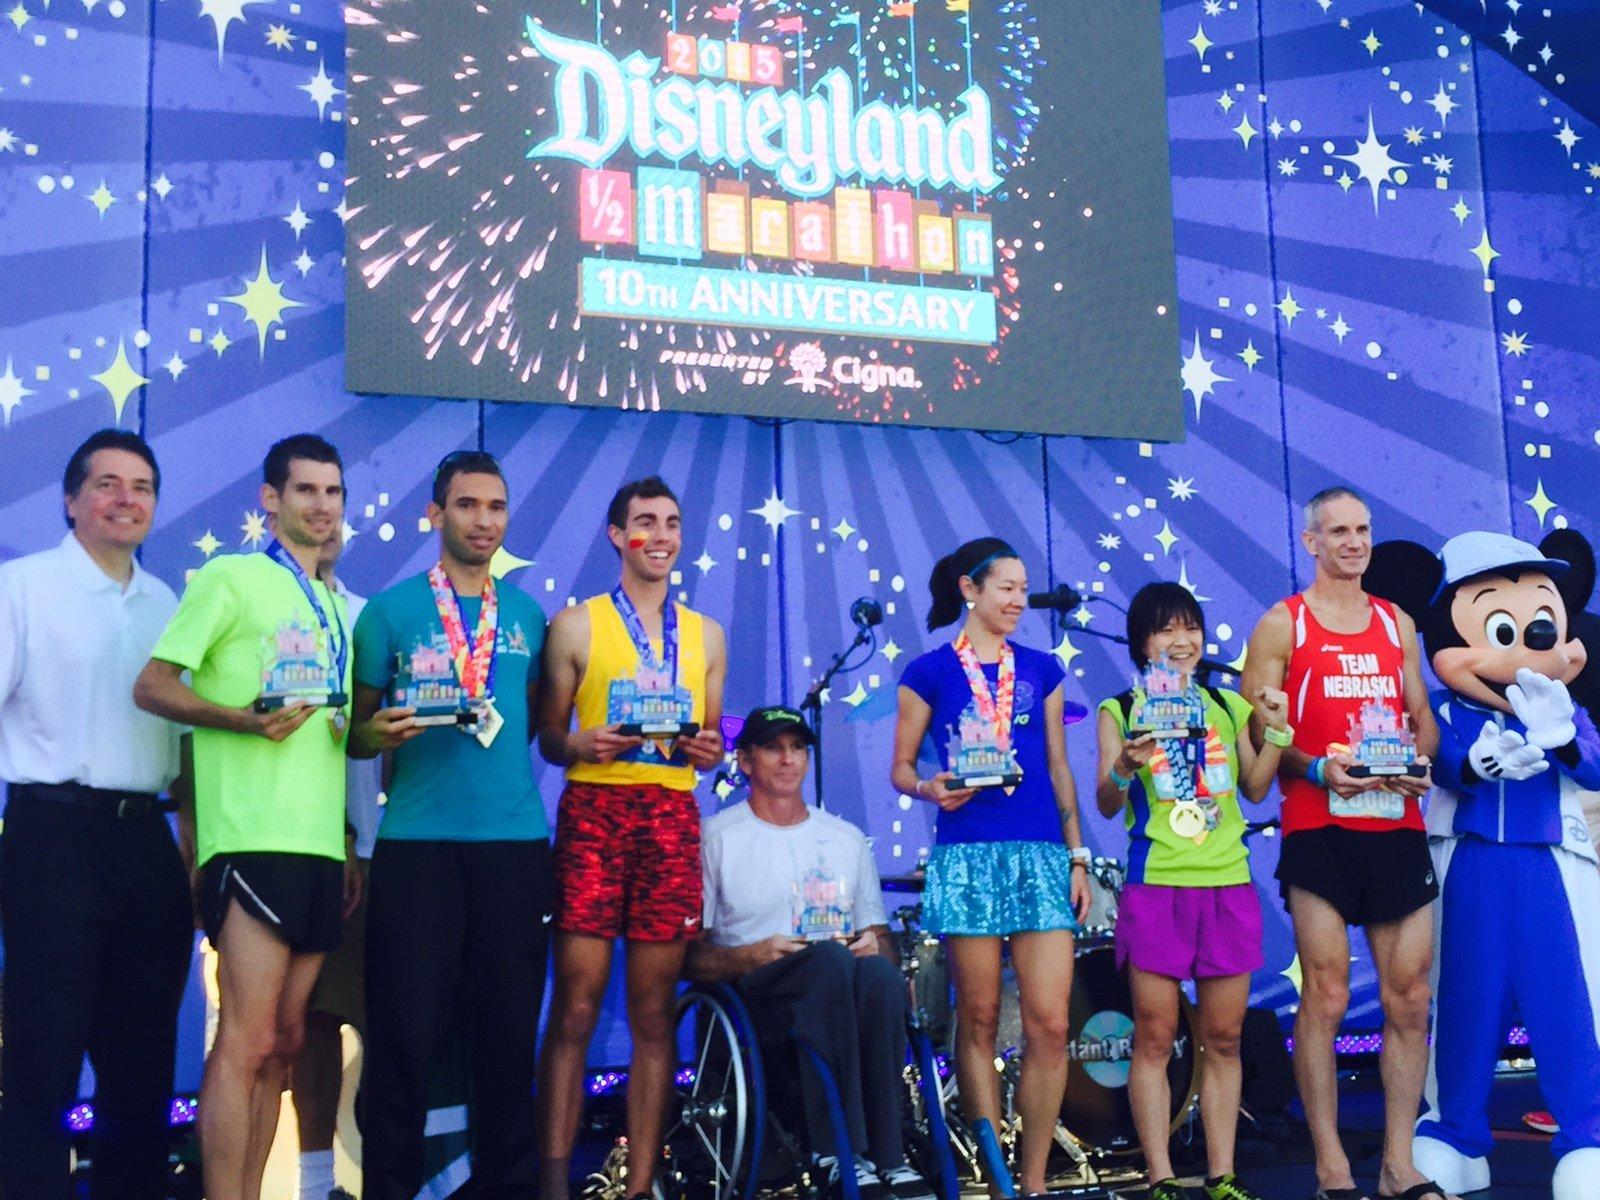 Dr. James winning a half marathon